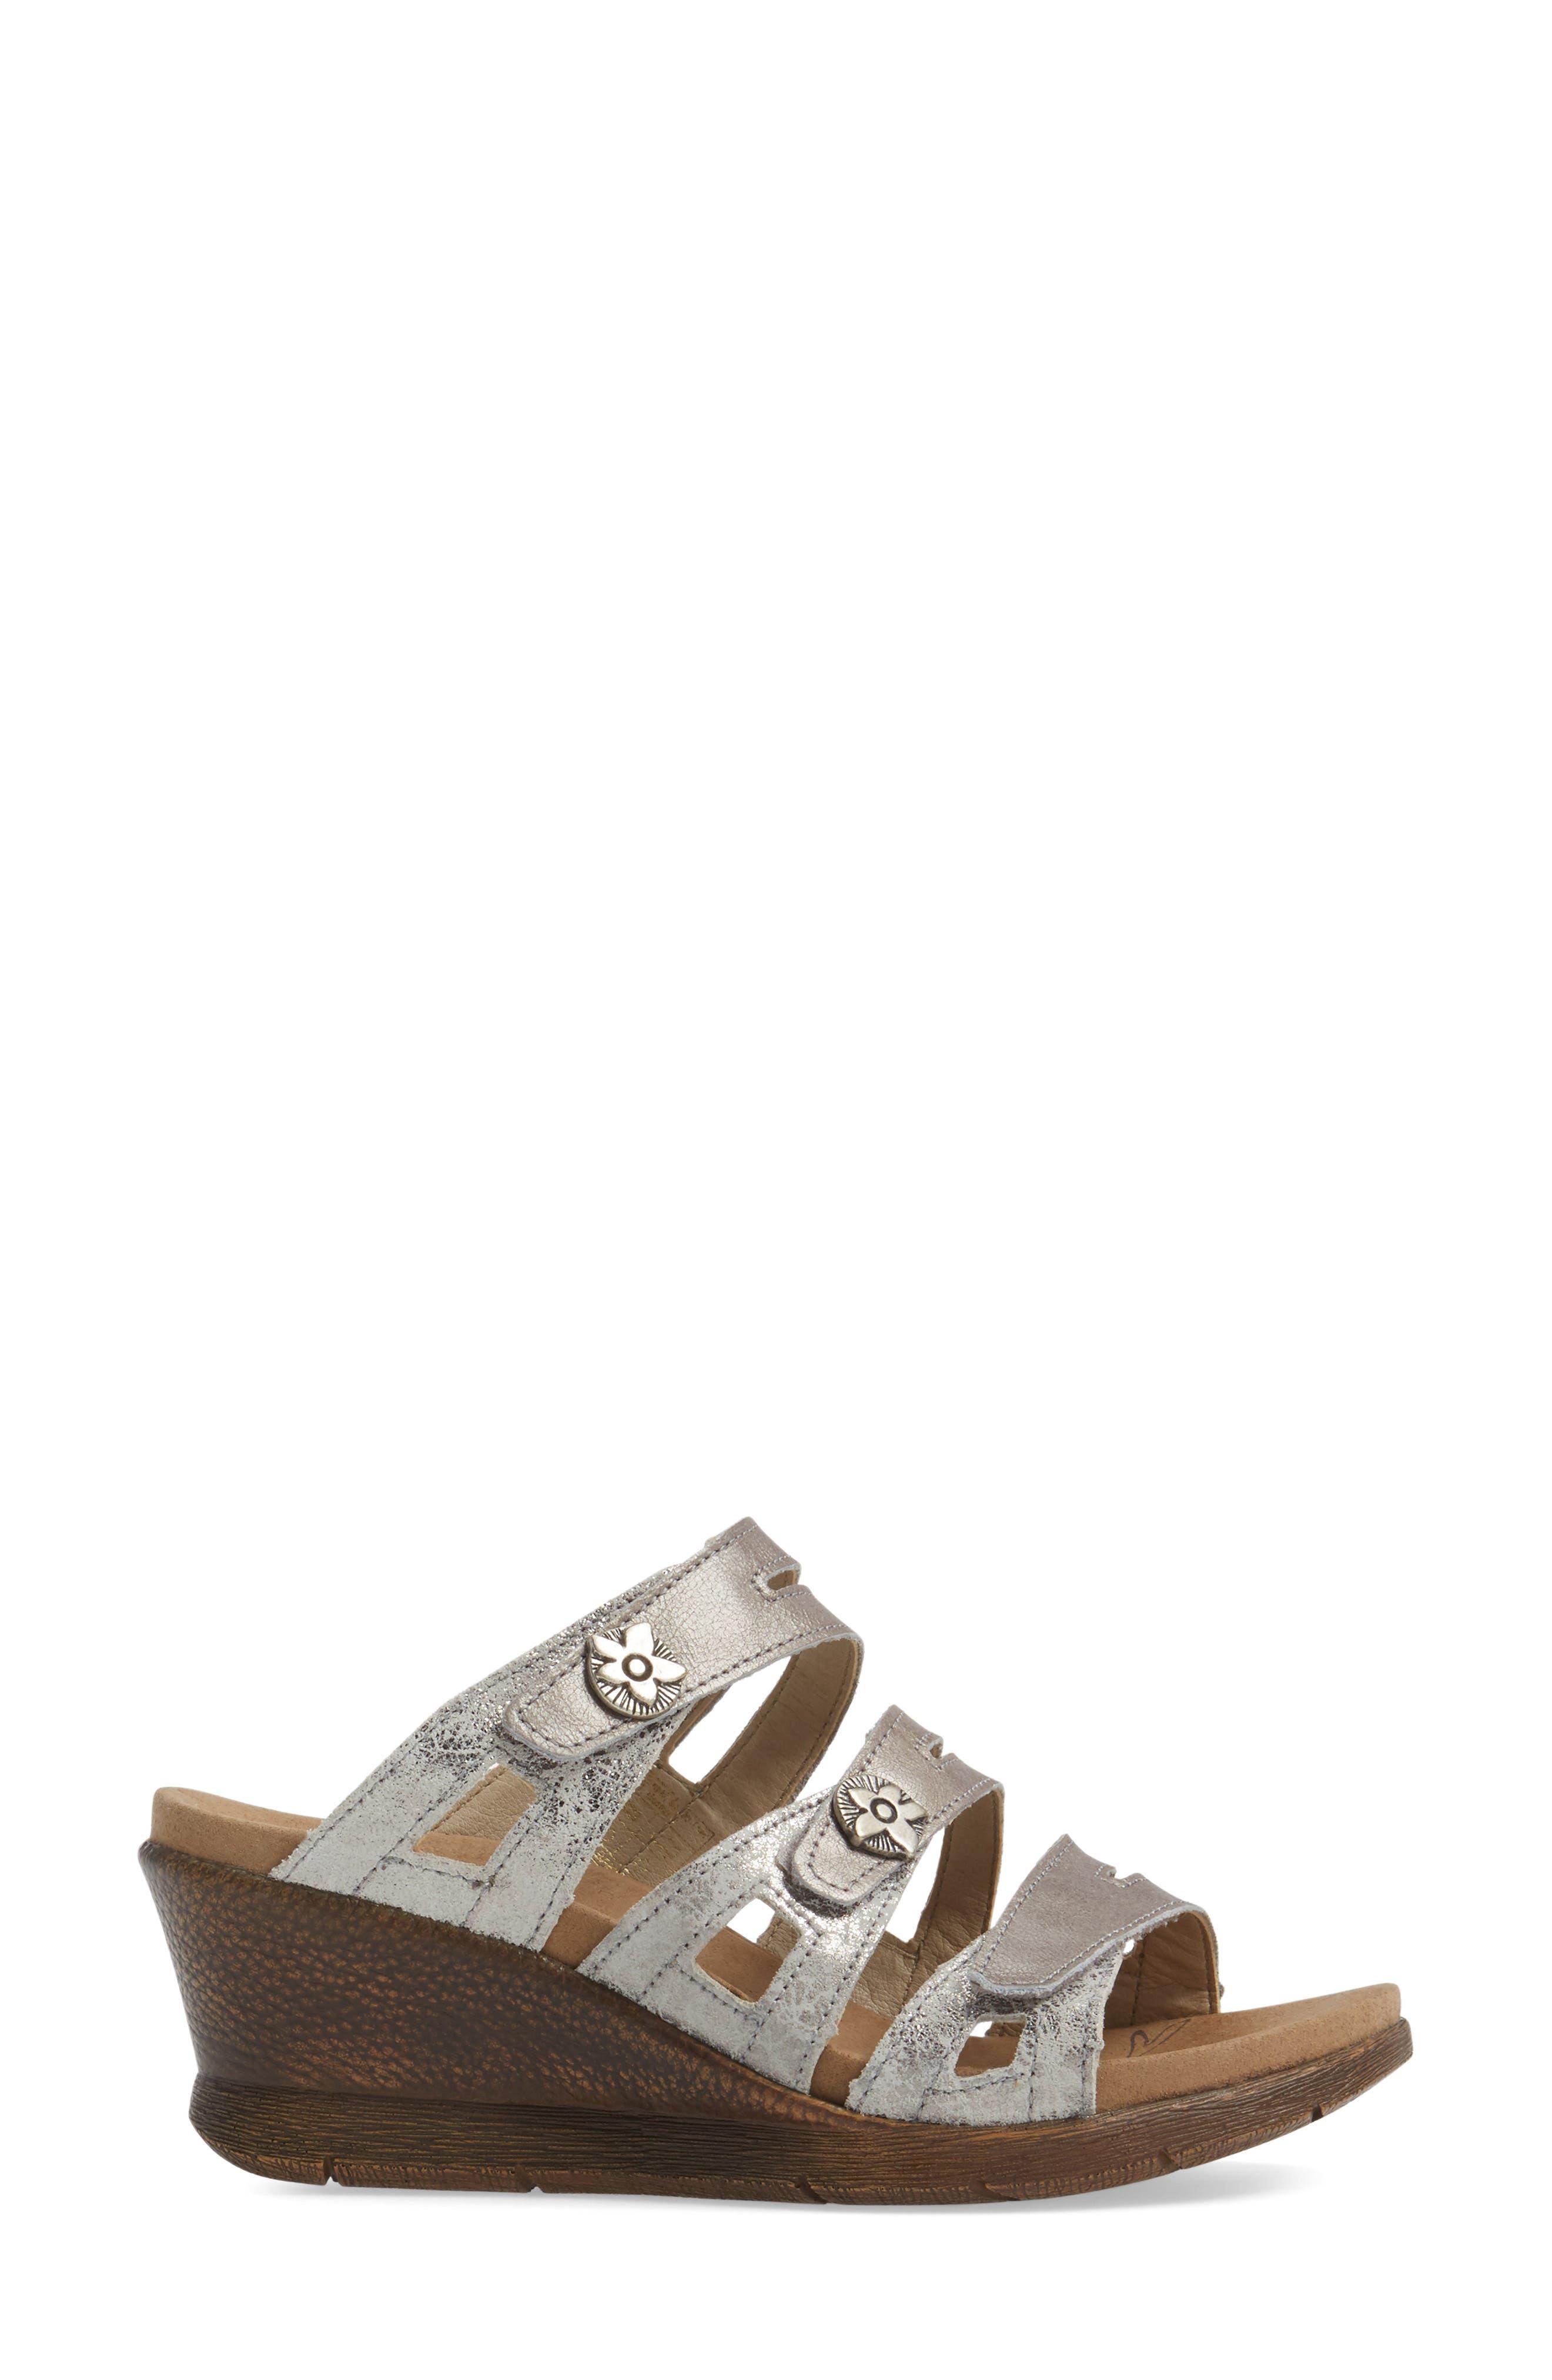 Nevis 04 Sandal,                             Alternate thumbnail 3, color,                             Platin Leather